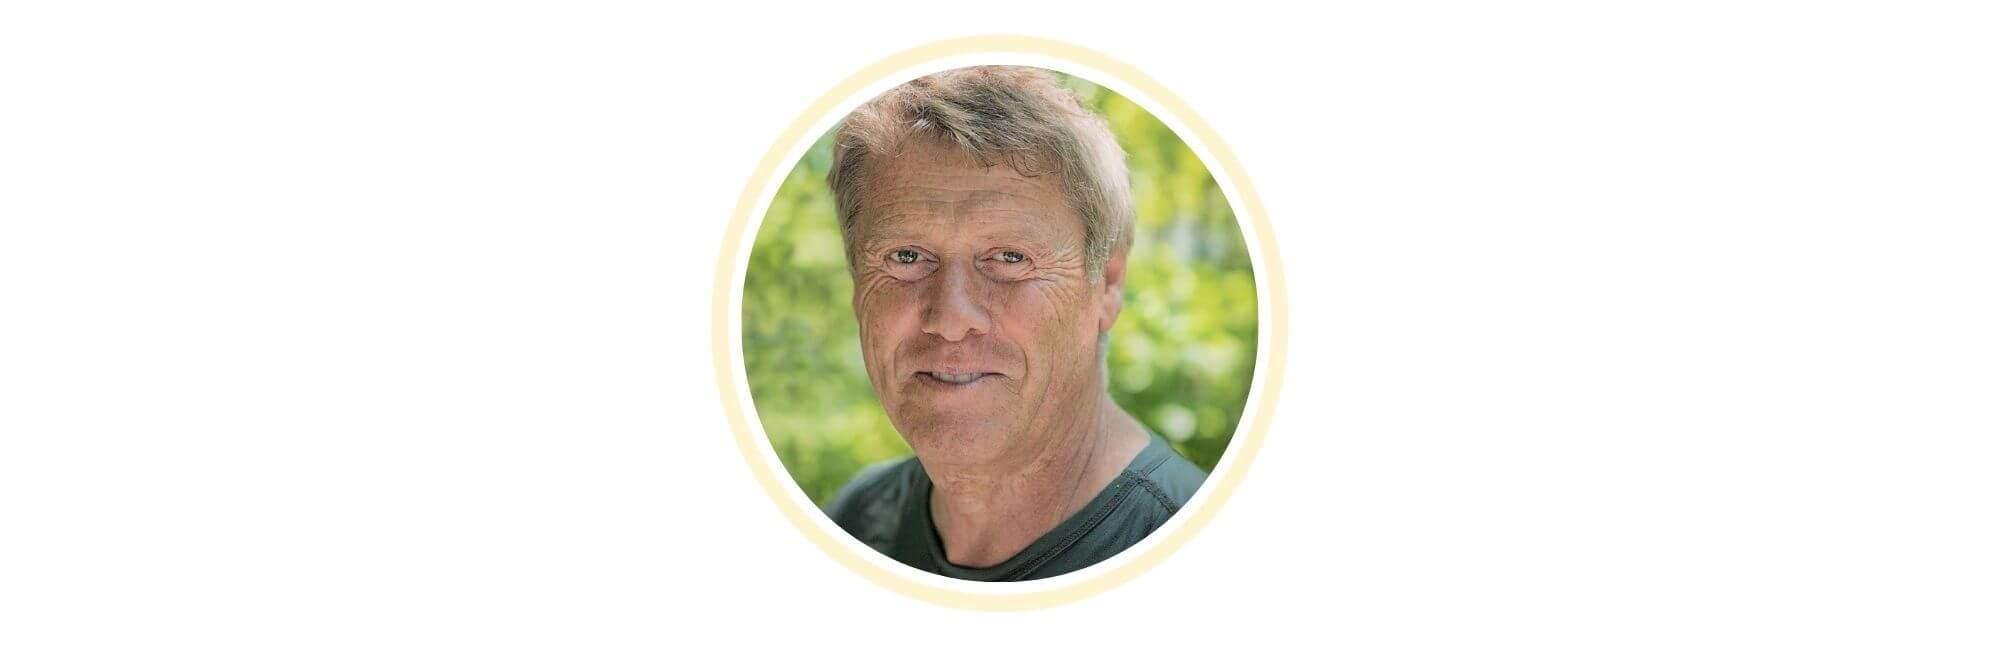 Acid Reflux Strategy Program creator-Scott Davis